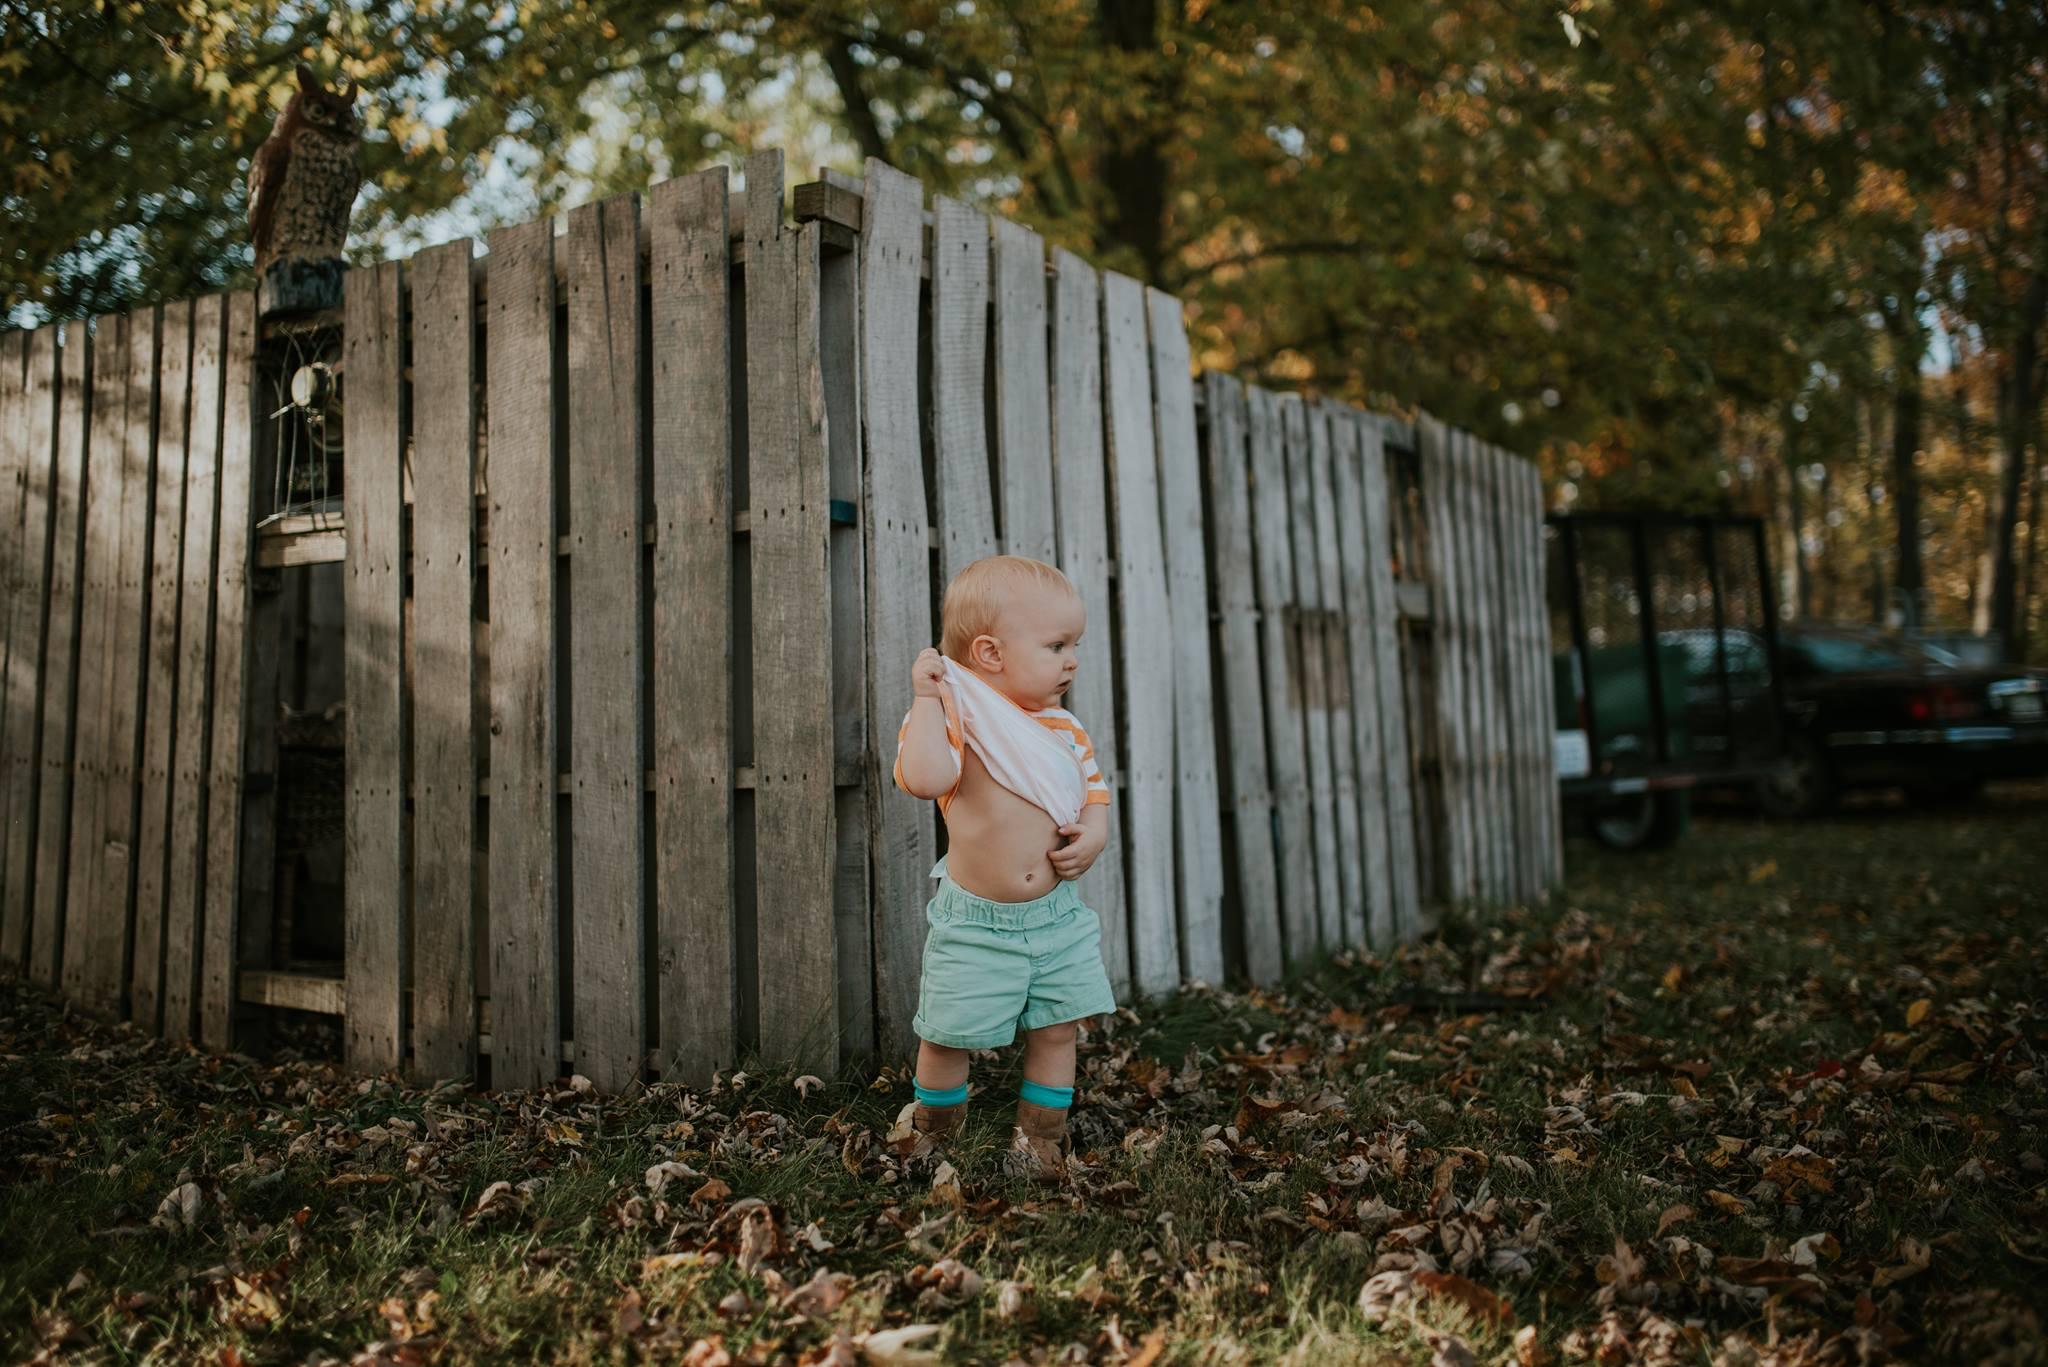 little boy picture ideas, lifestyle pictures